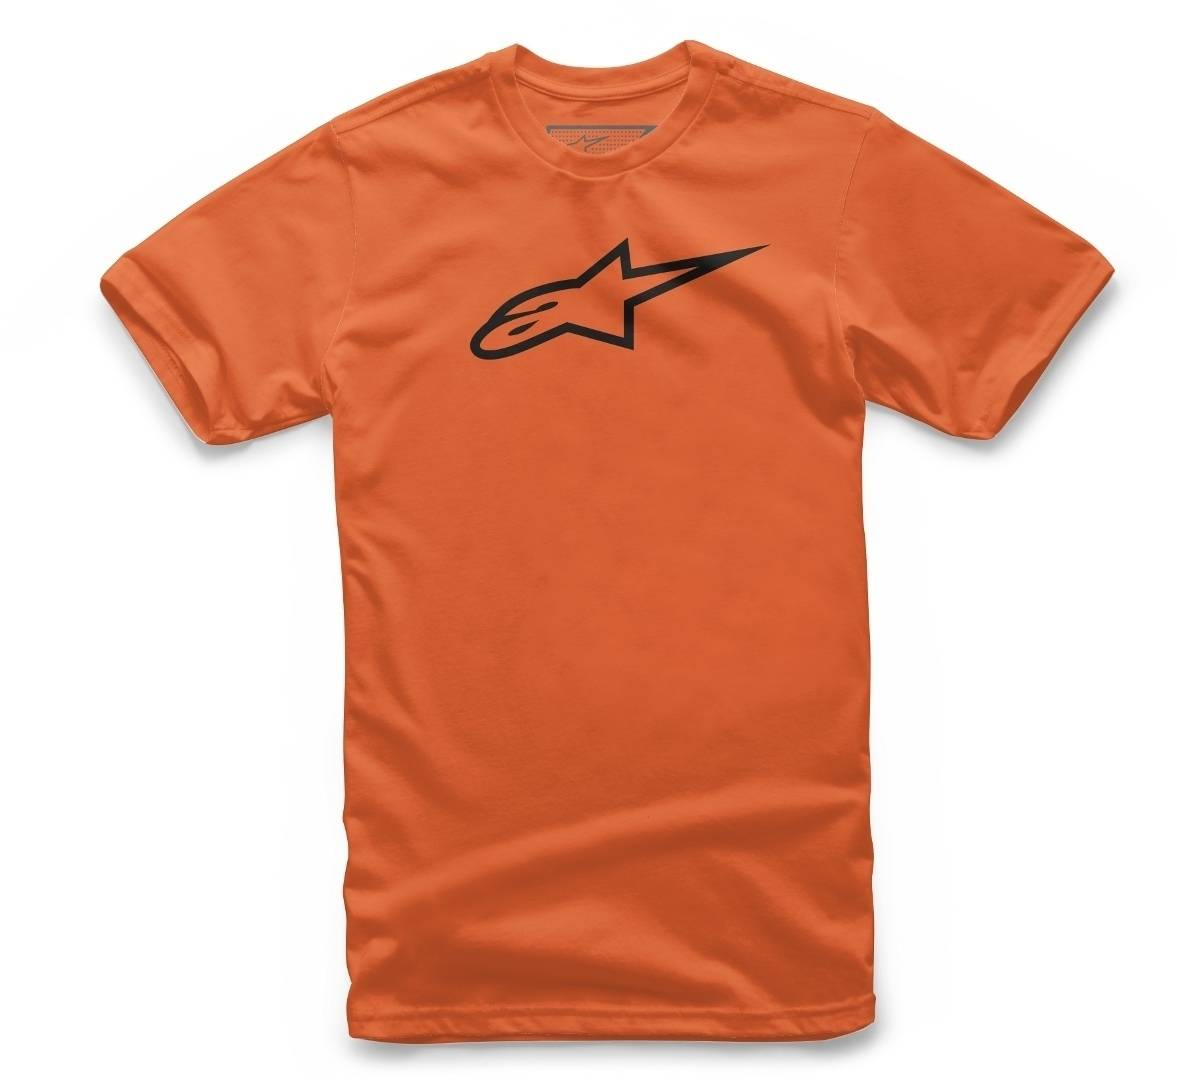 Alpinestars Juvy Ageless T-Shirt per bambini Nero Arancione 3 - 4